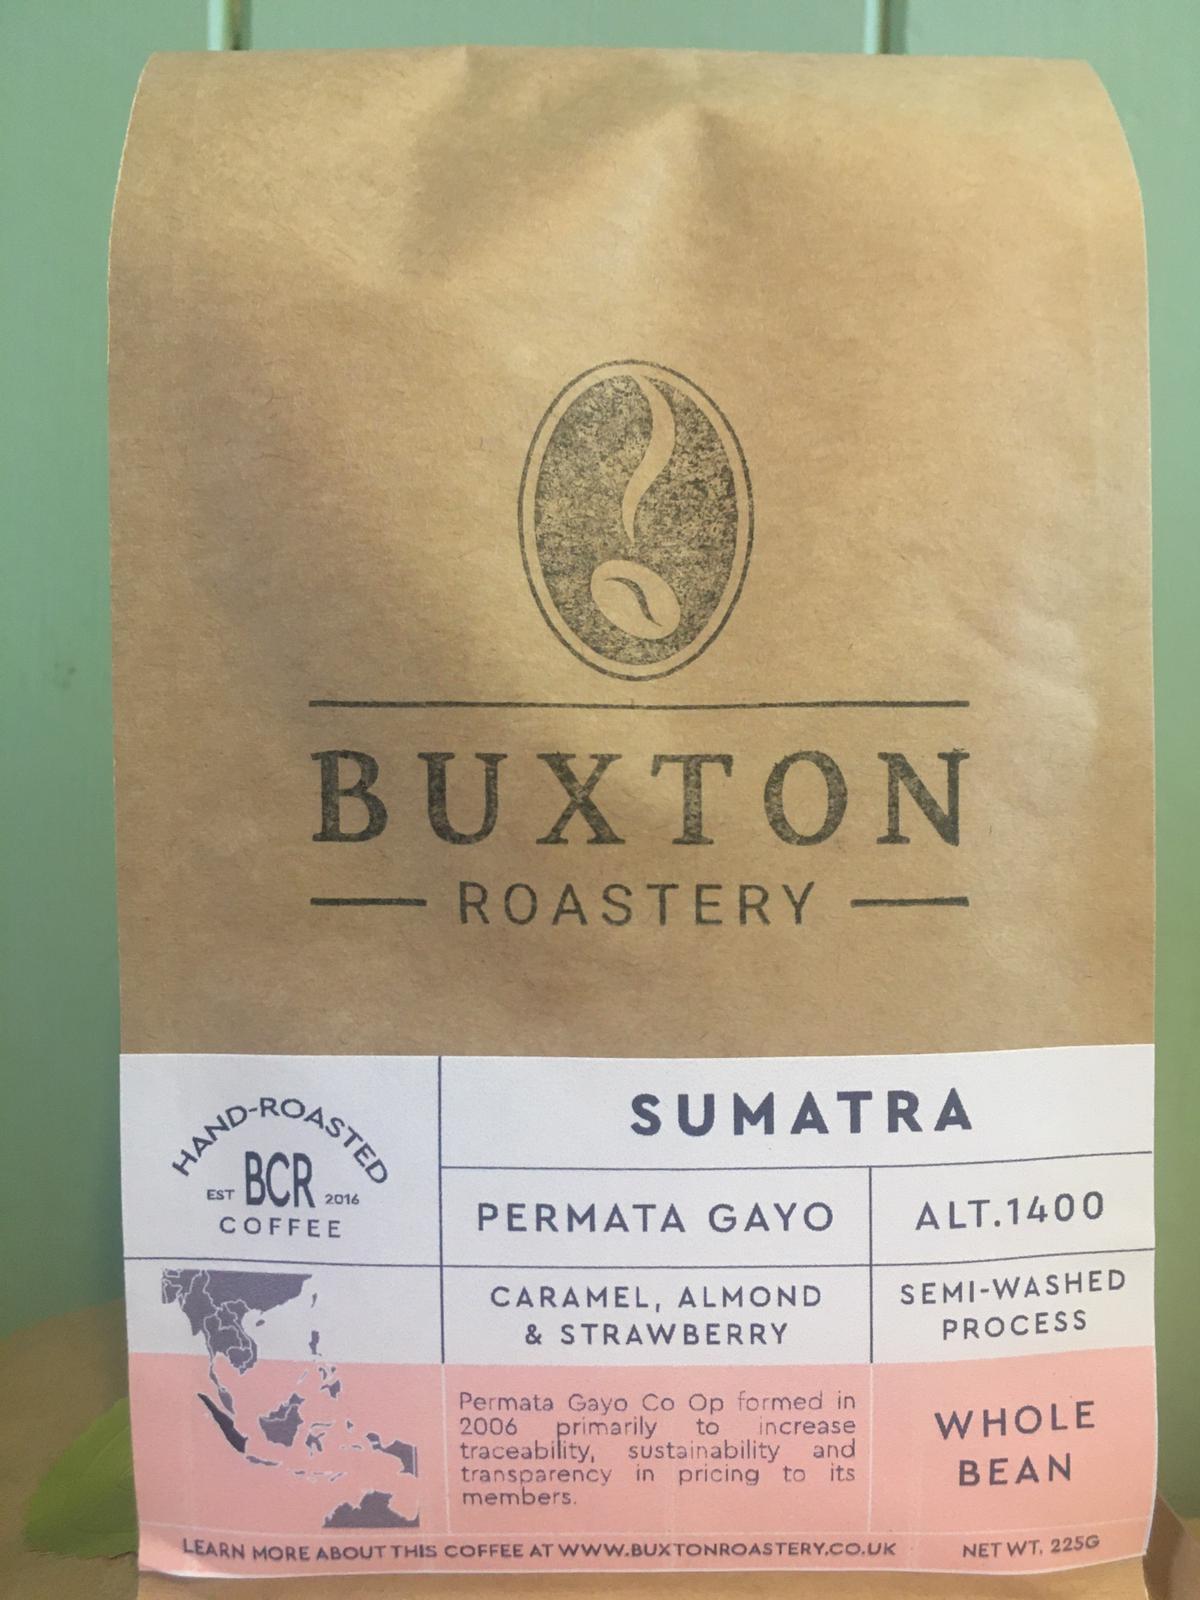 Buxton Roastery Coffee - Sumatra Permata Gayo 225g